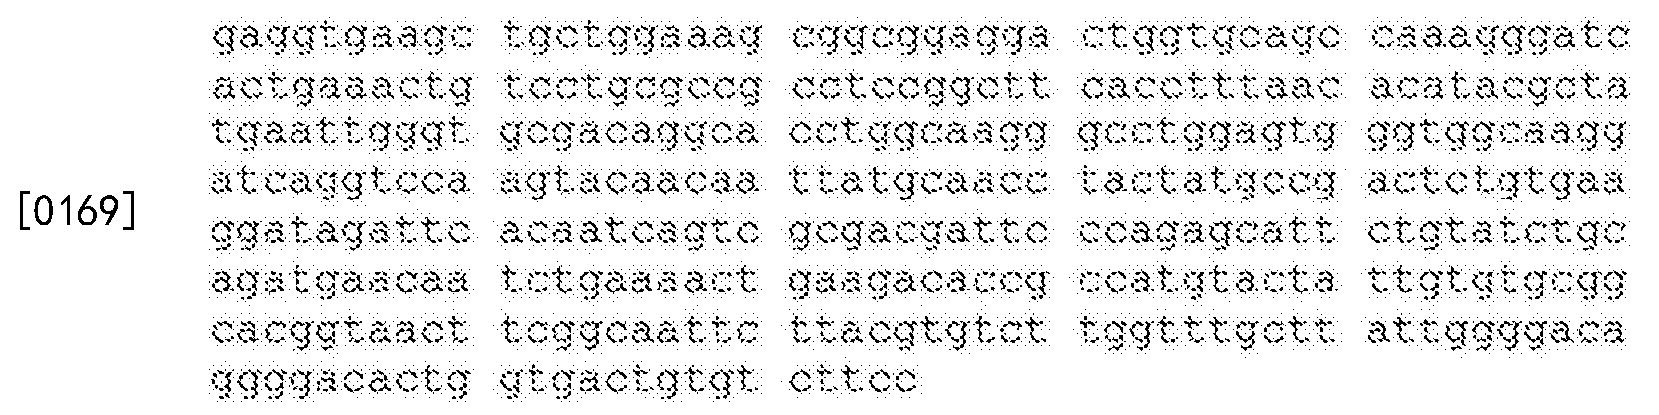 Figure CN107827985AD00281